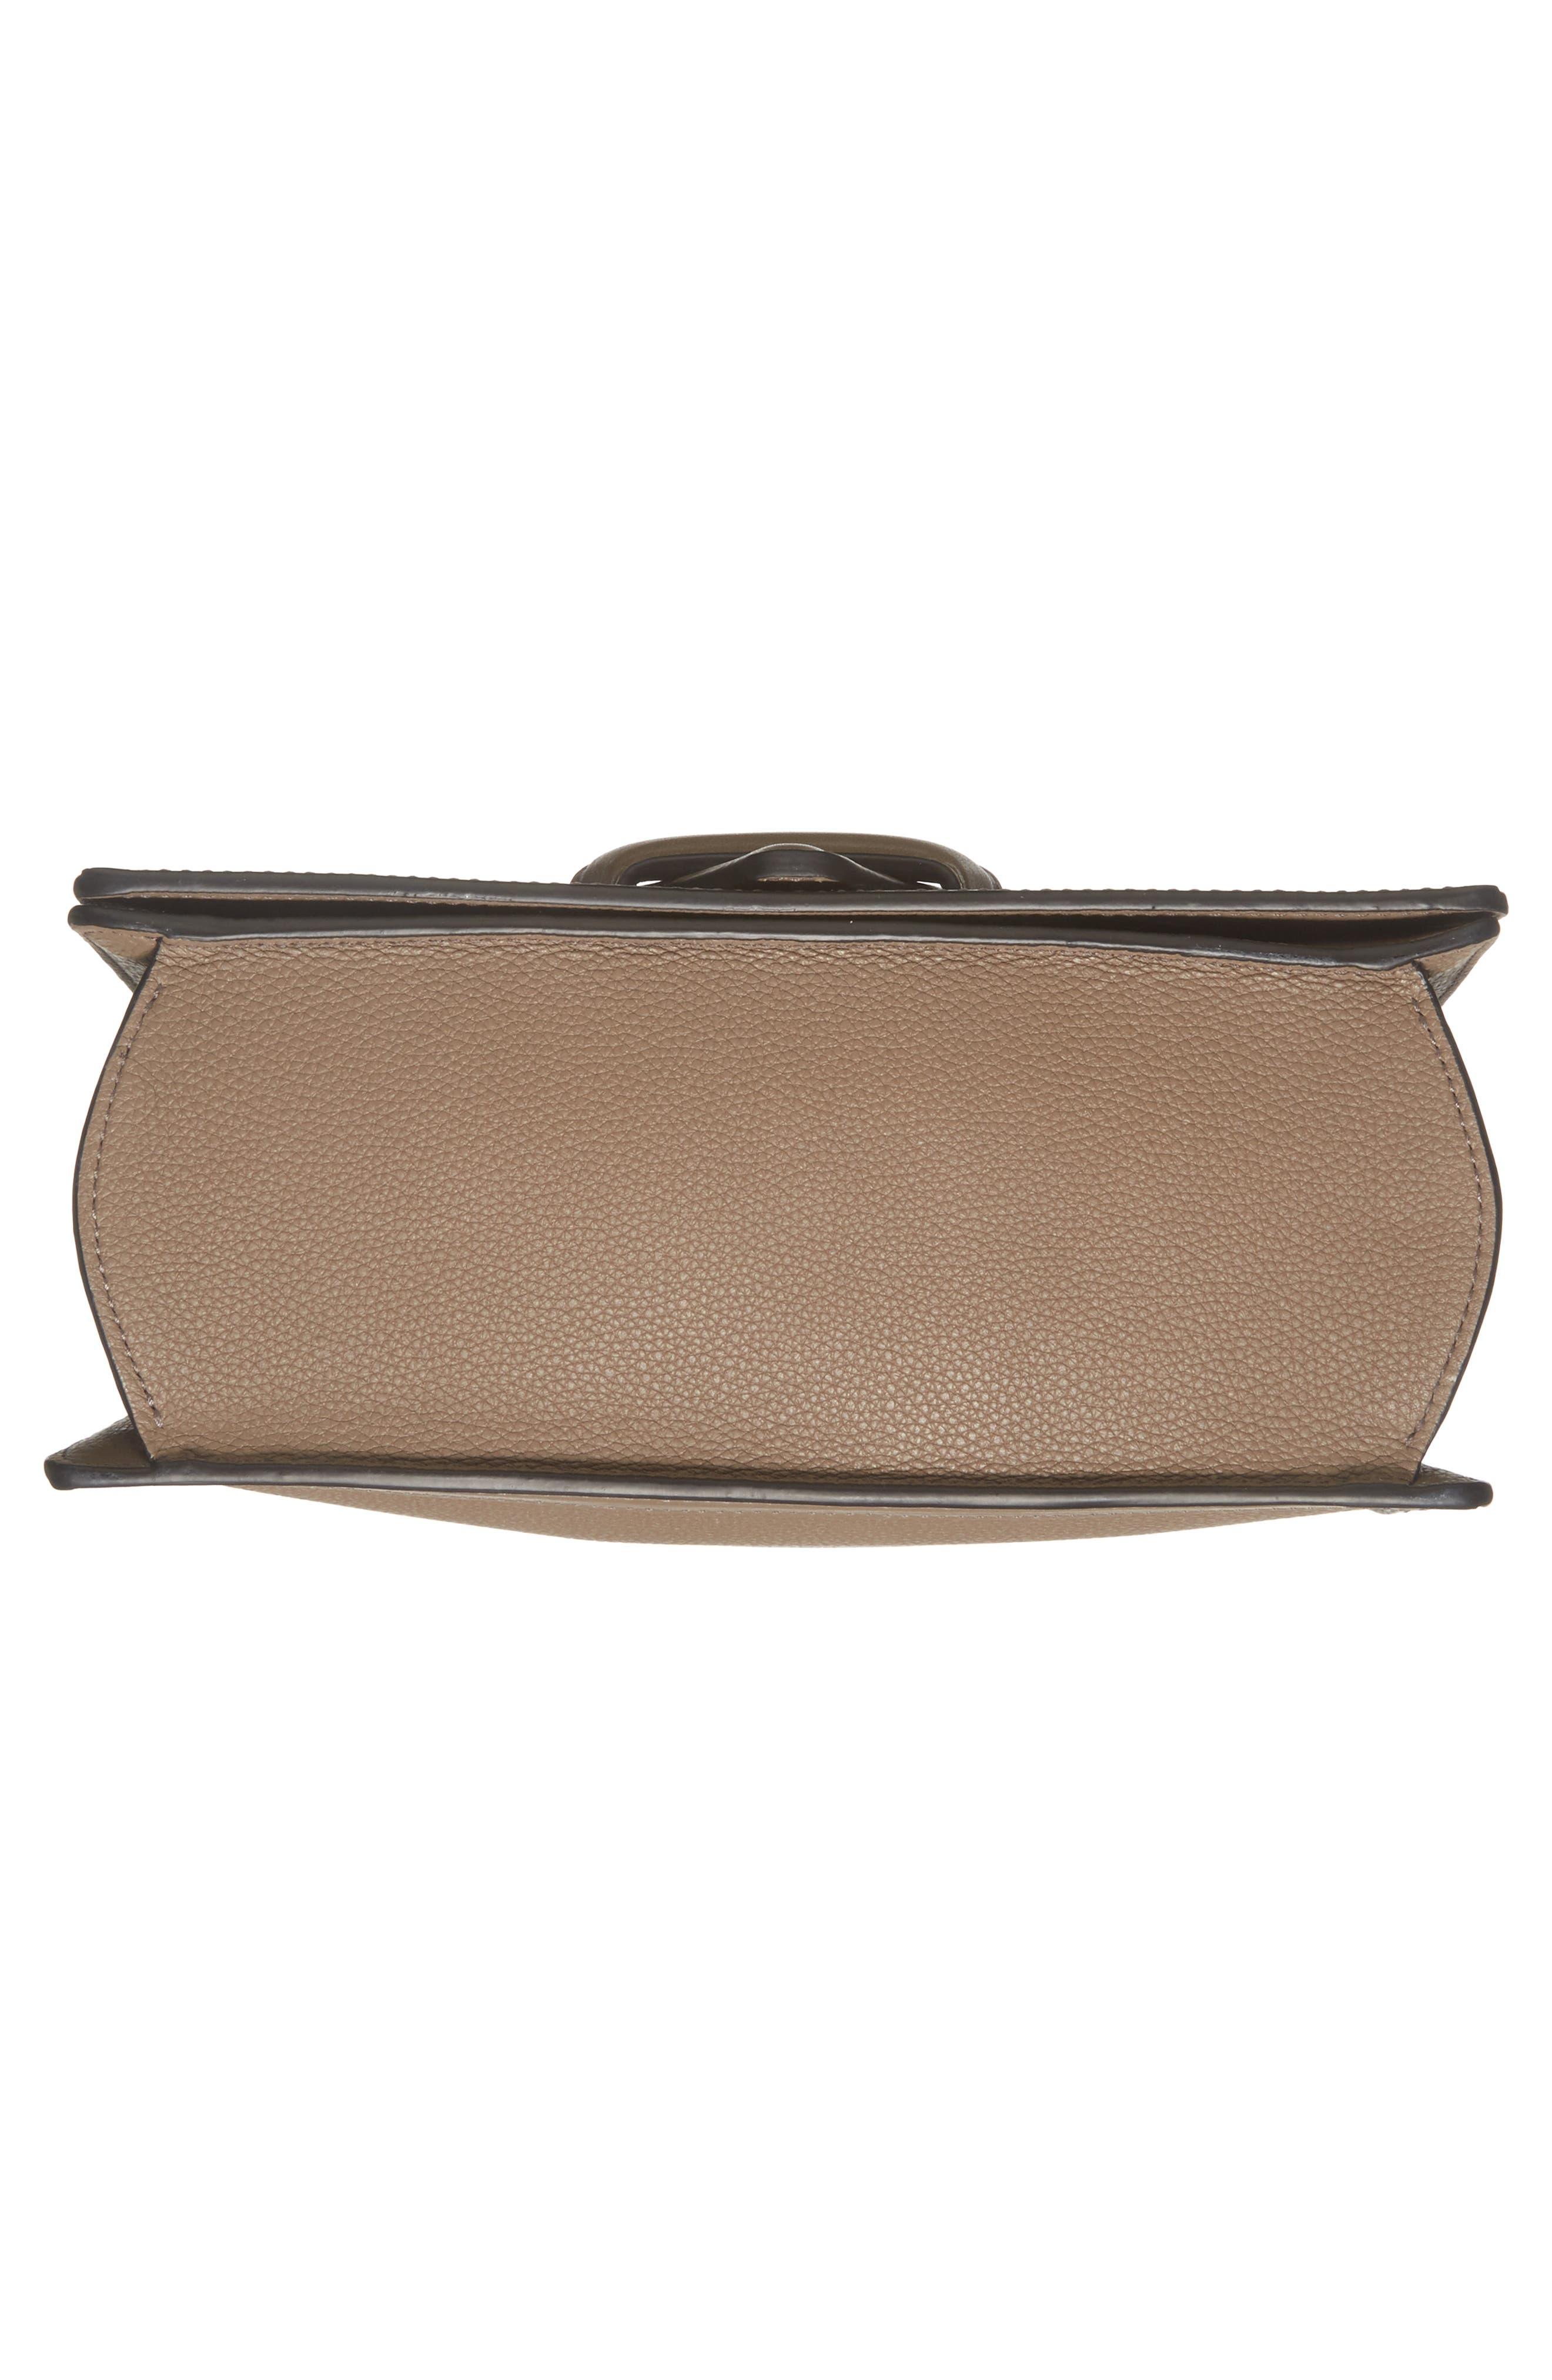 Medium Barcelona Leather Crossbody Bag,                             Alternate thumbnail 5, color,                             Dark Taupe